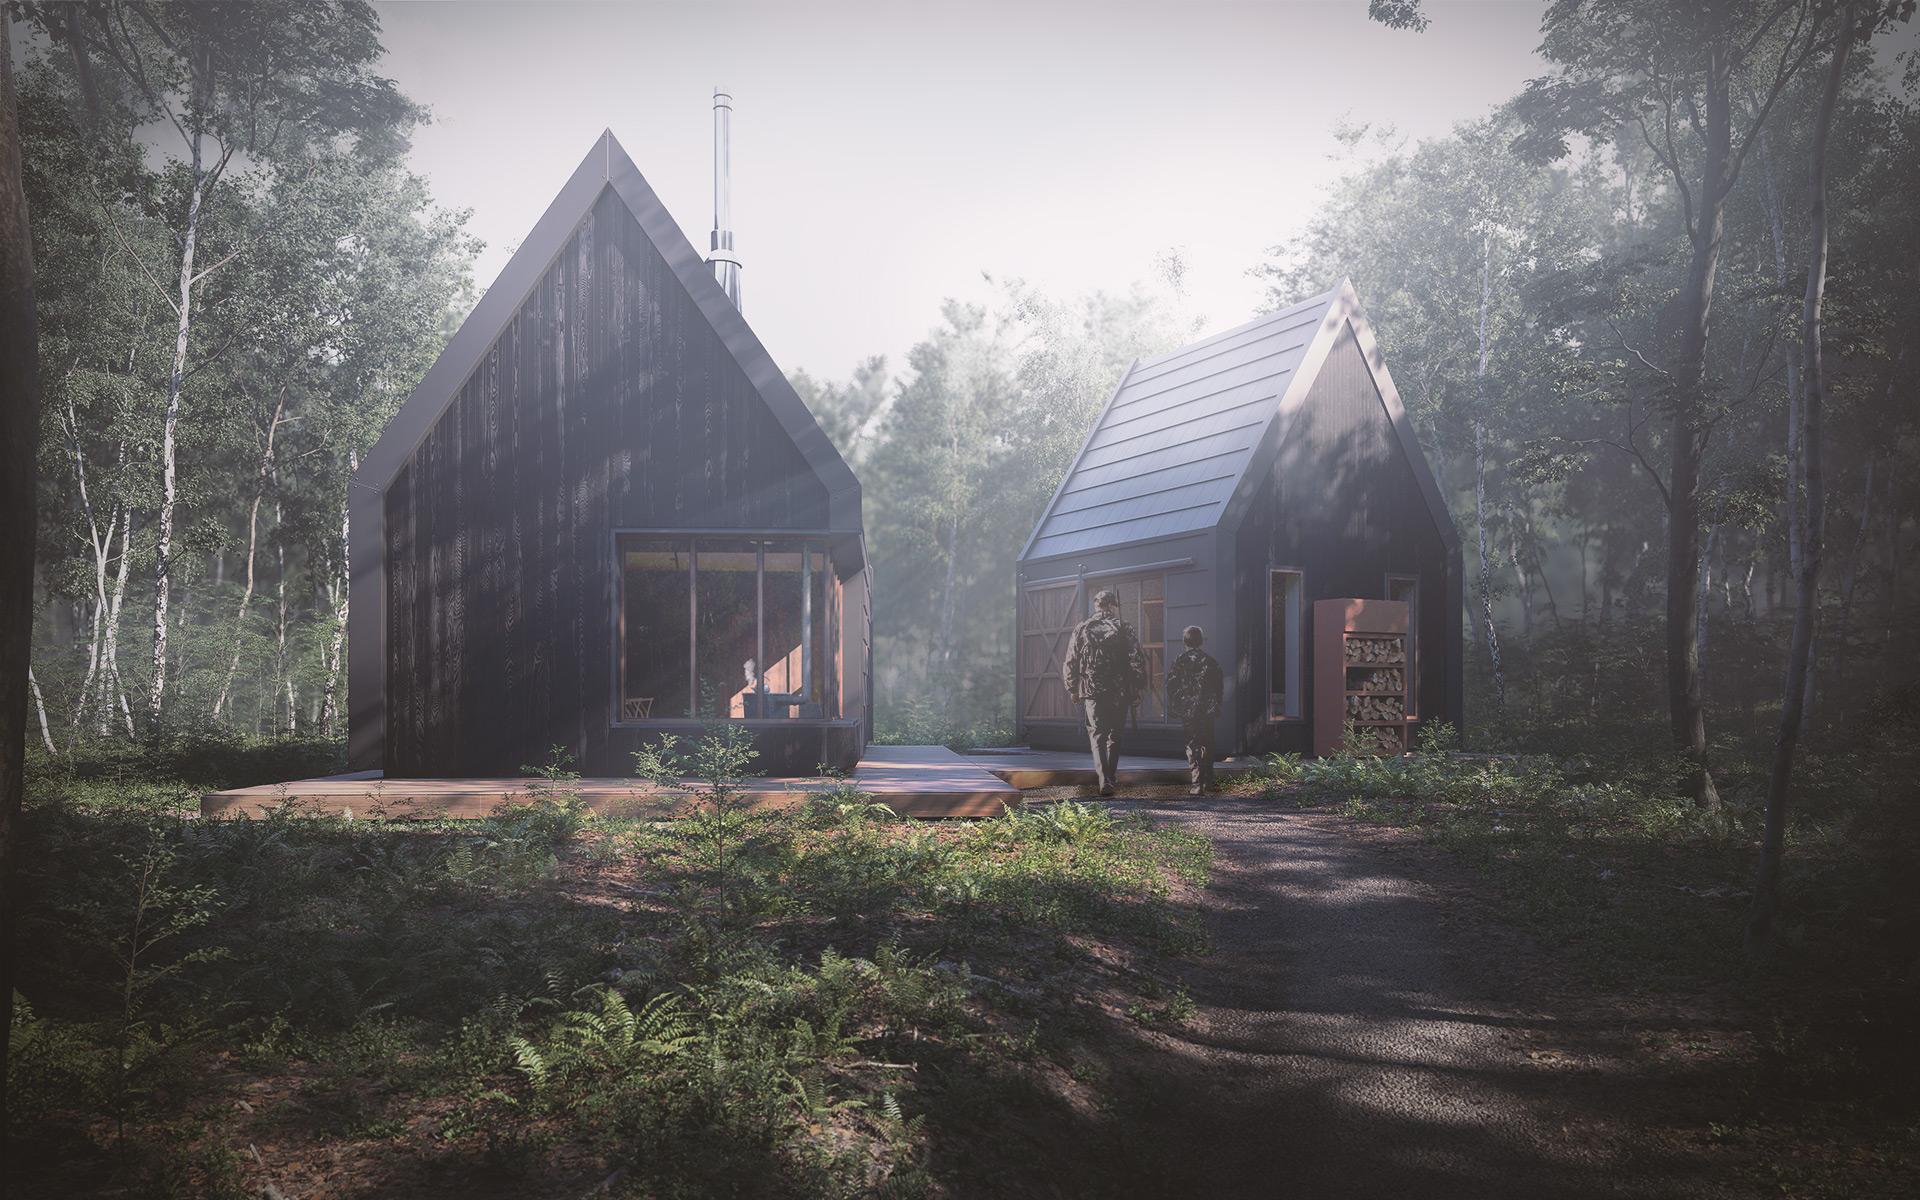 Forest Cabin Architectural Visualization